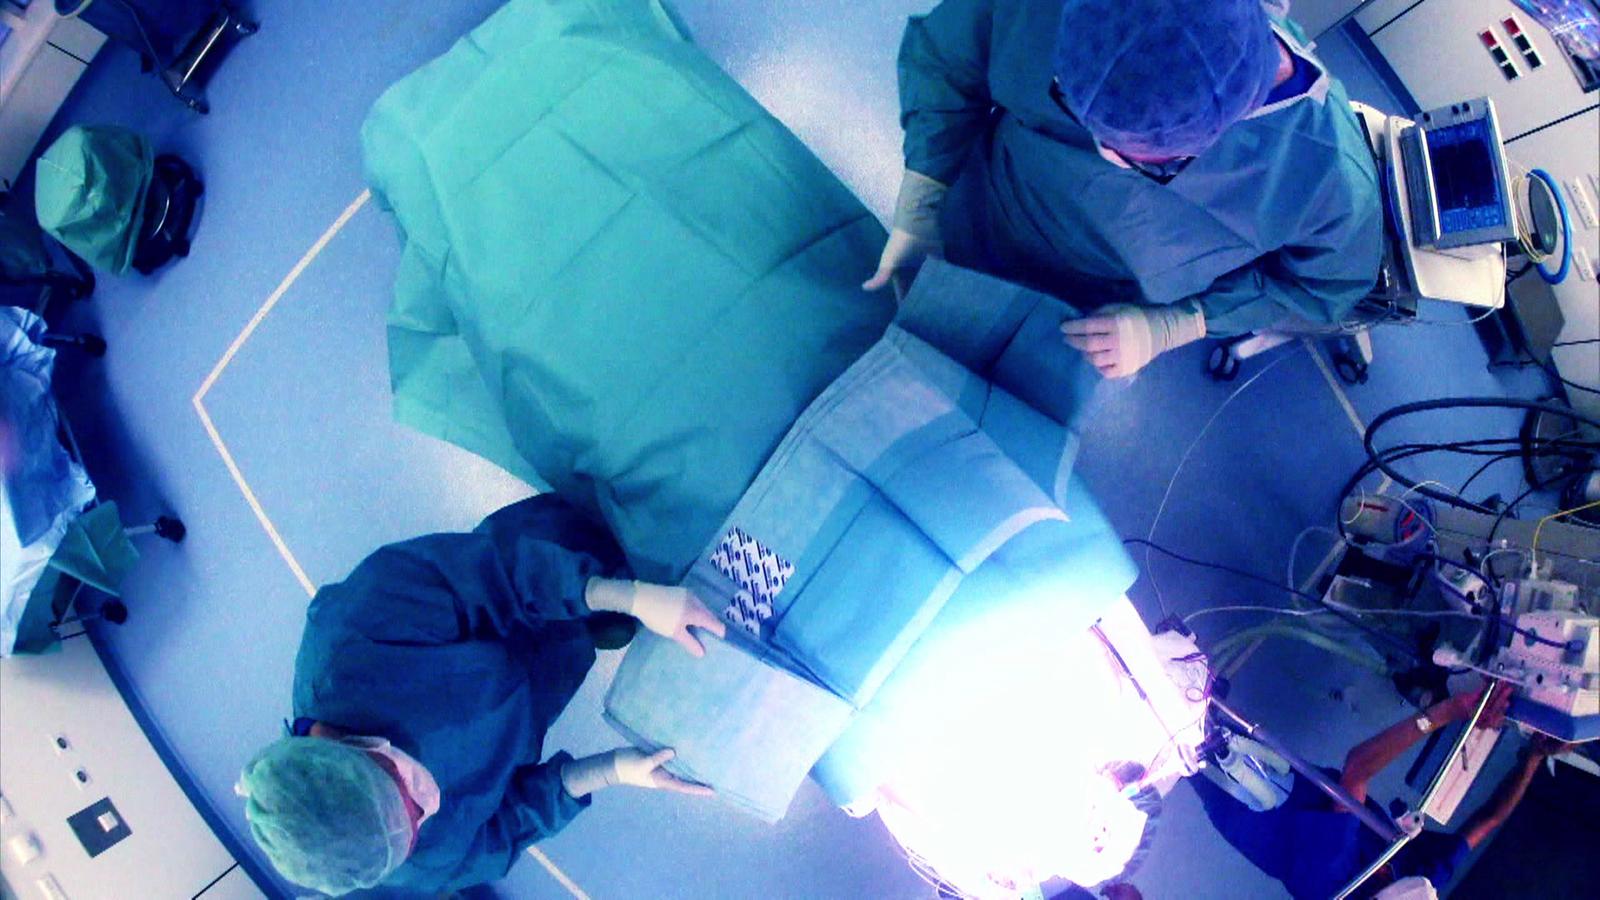 krankenhaus medizin gesellschaft planet wissen. Black Bedroom Furniture Sets. Home Design Ideas